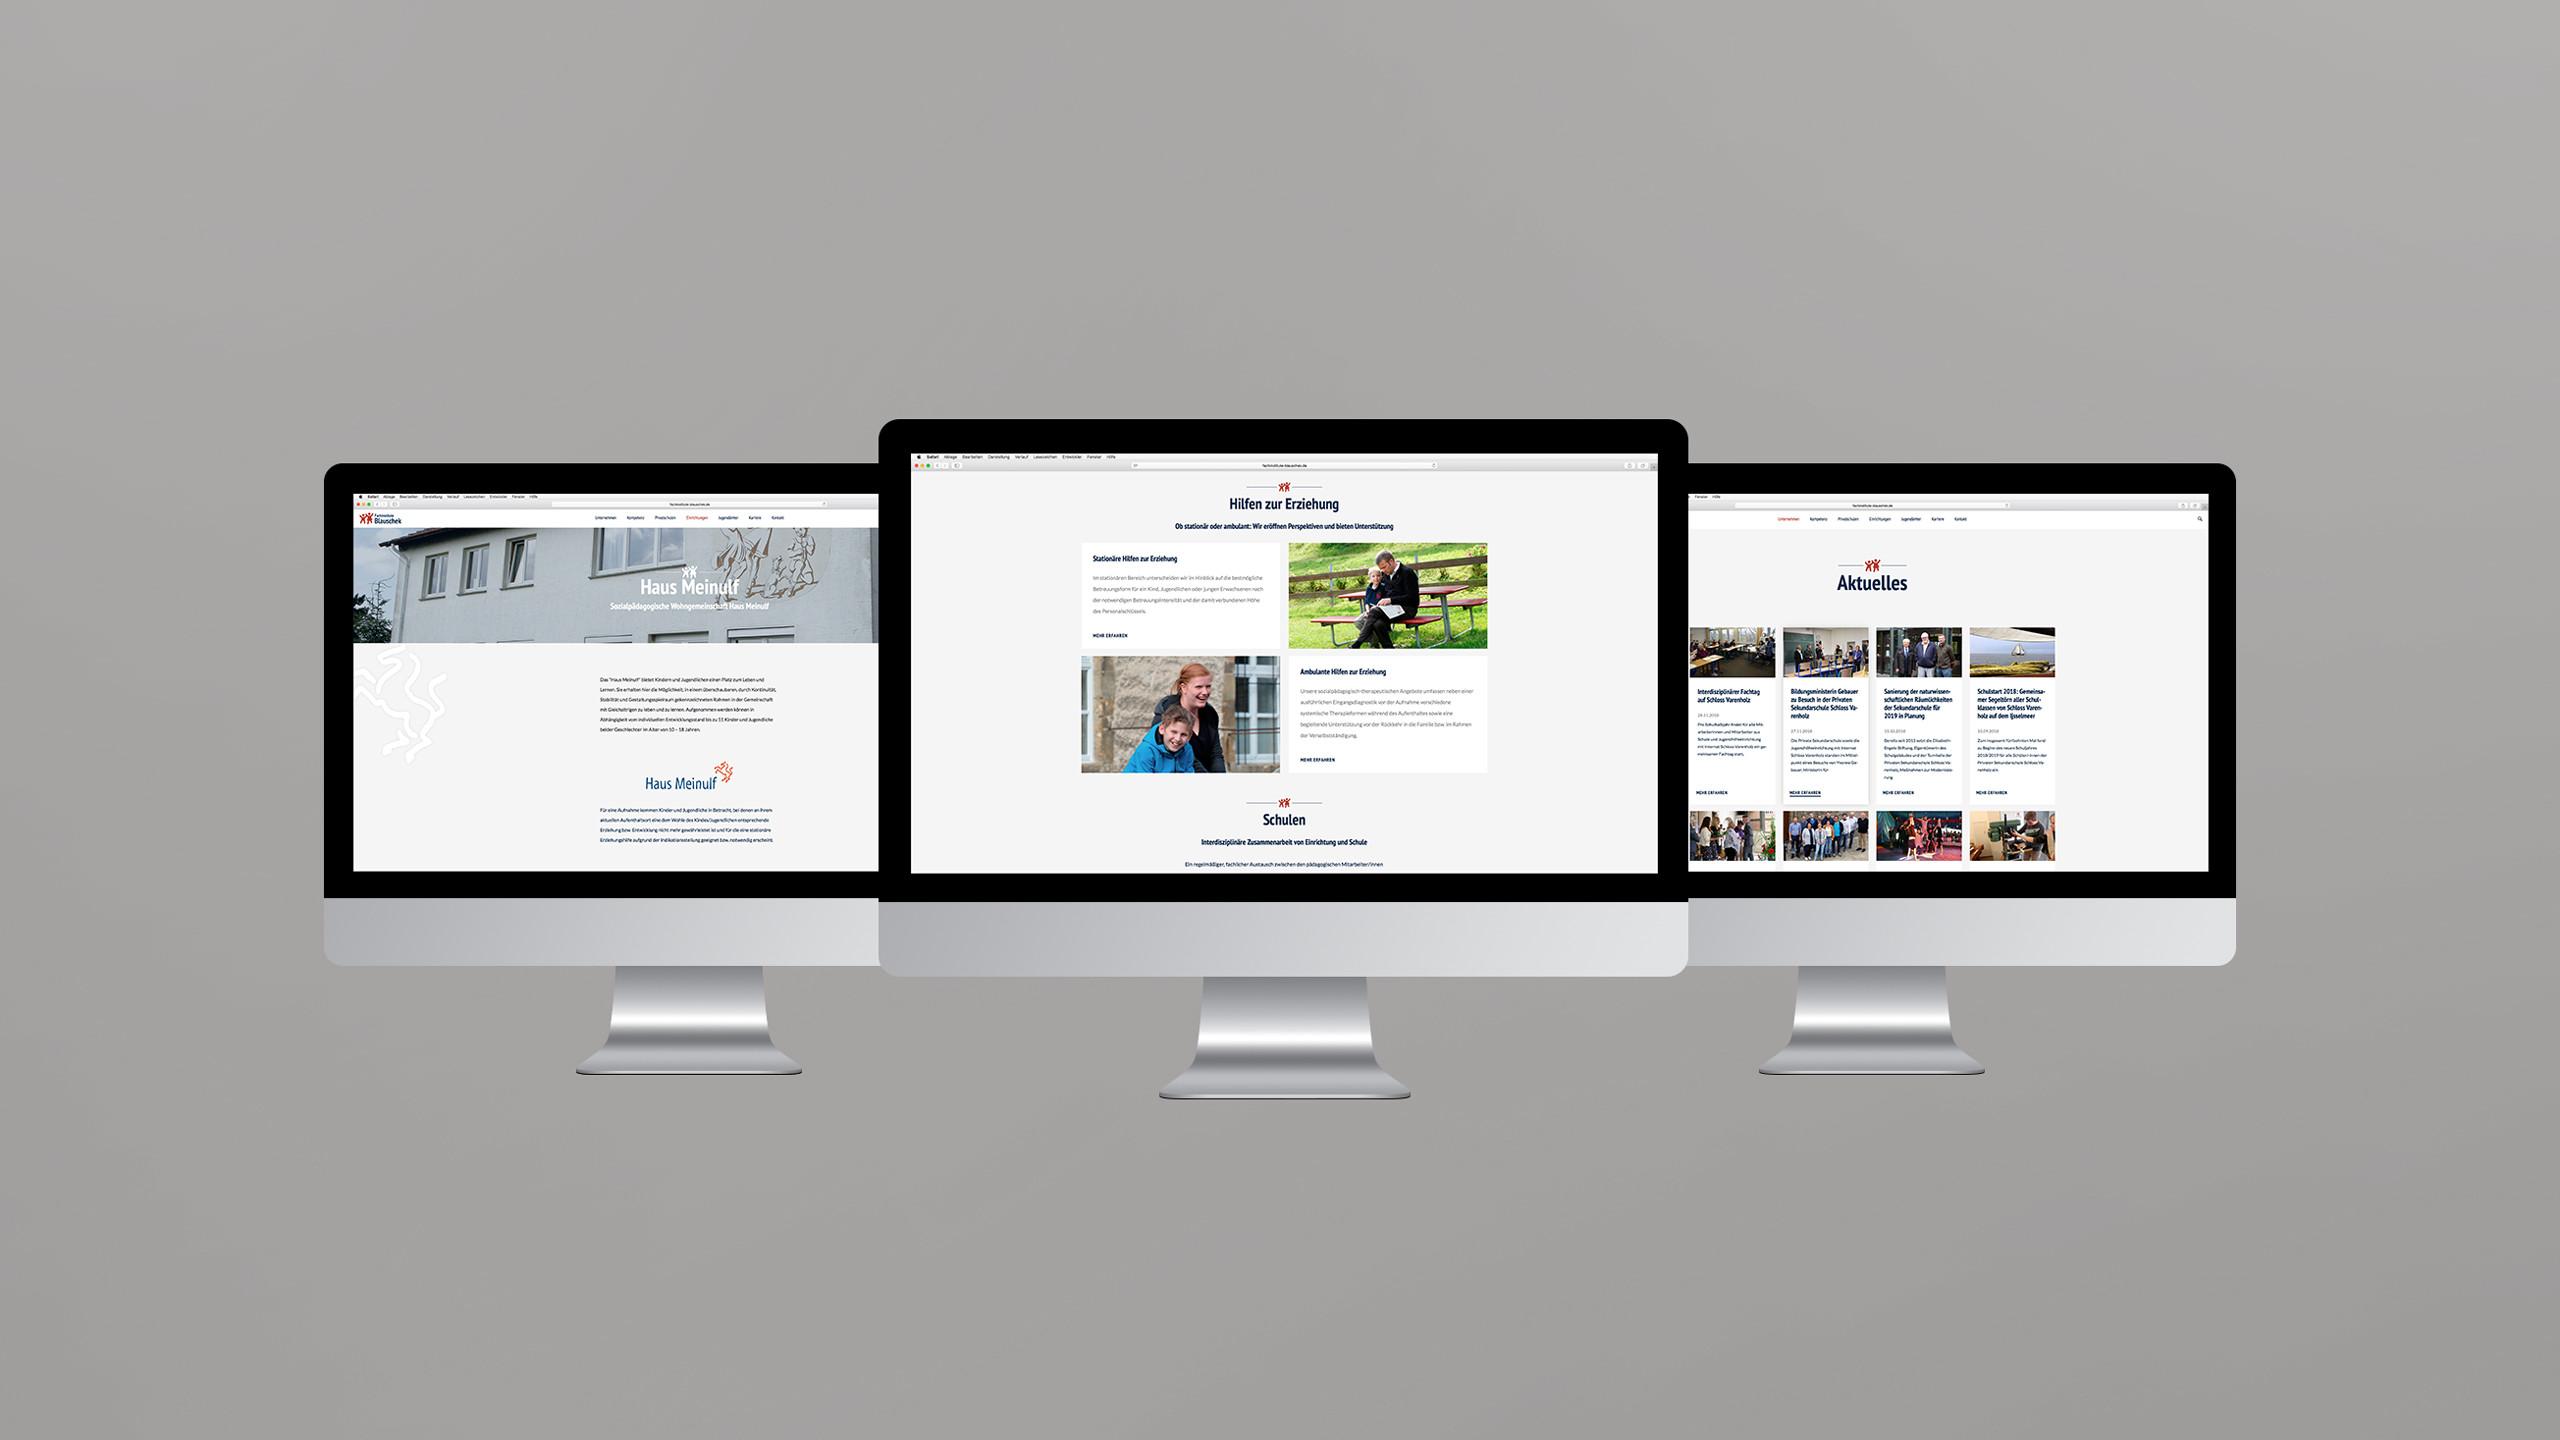 fib-website-layout-2